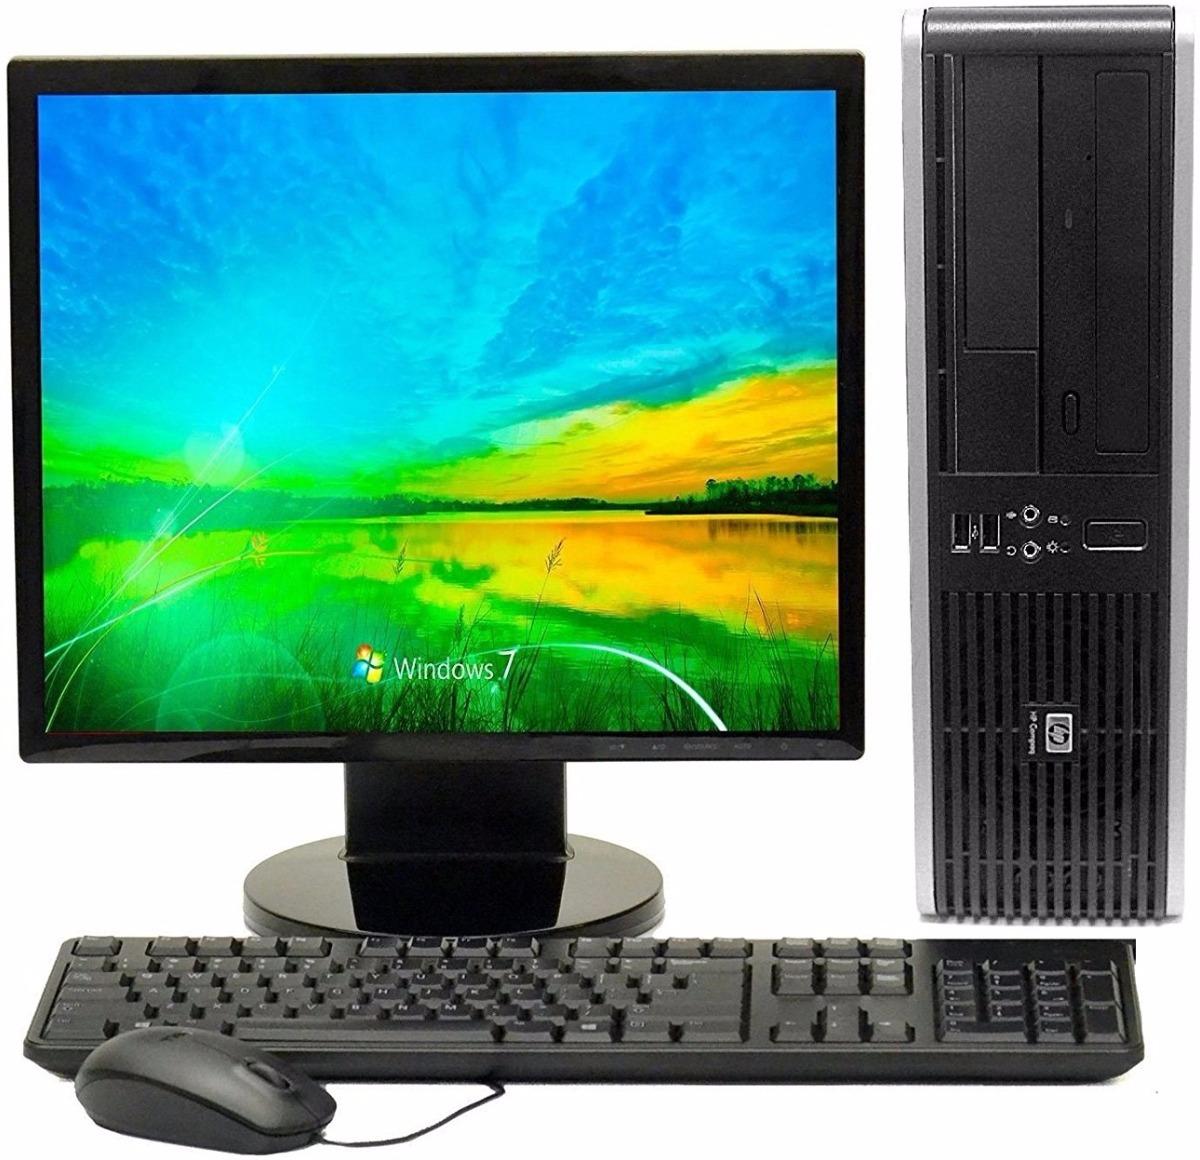 Pc Computadora Completa + Monitor + Impresora Multifuncion - $ 8.420,00 en  Mercado Libre